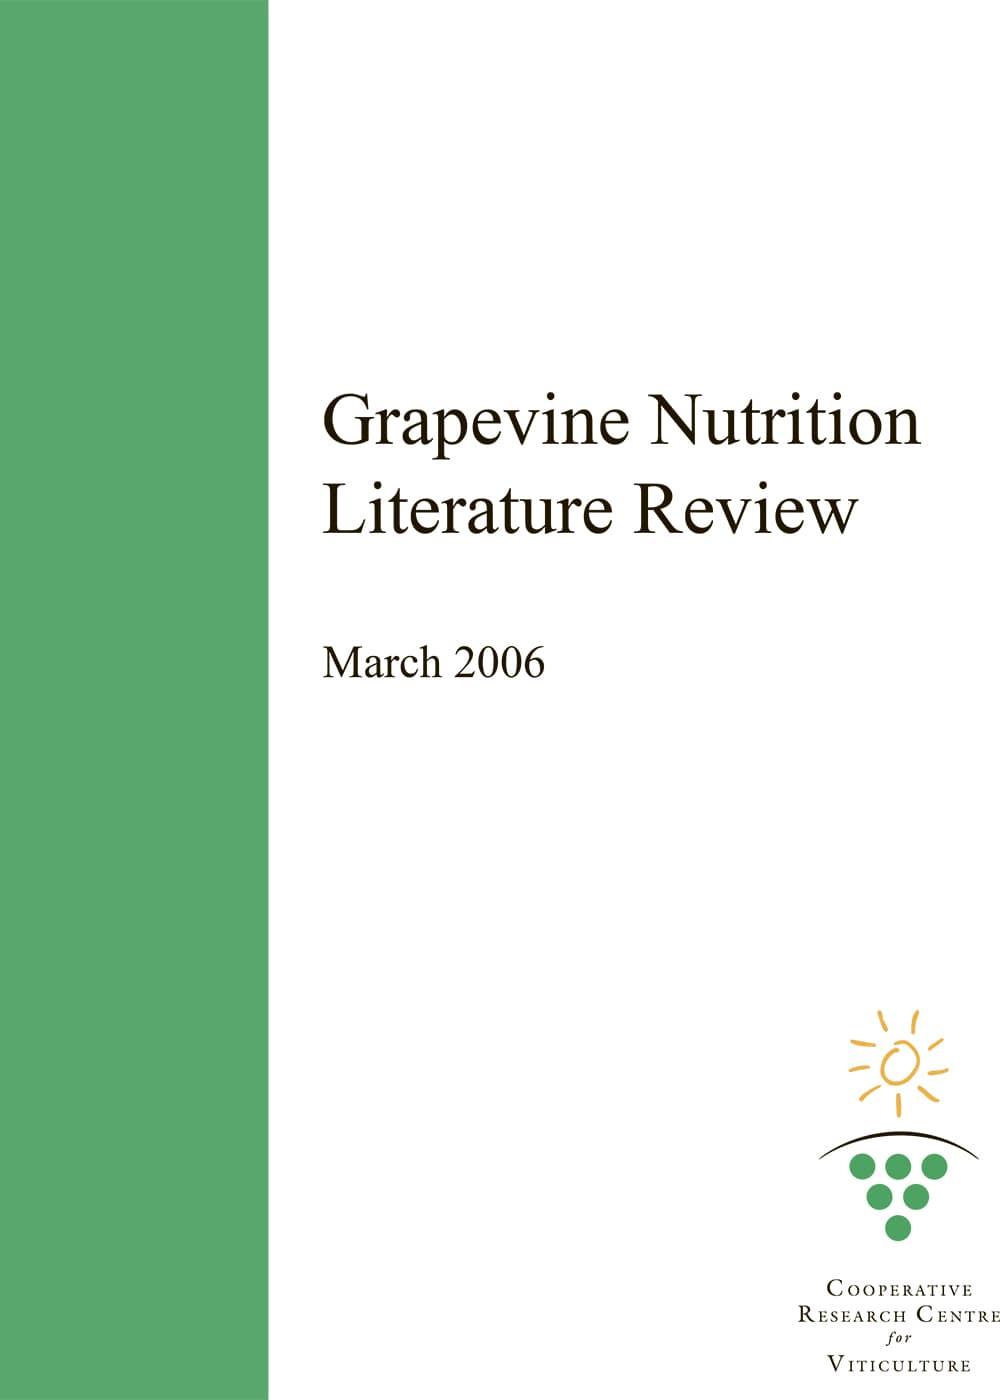 Grapevine Nutrition Literature Review